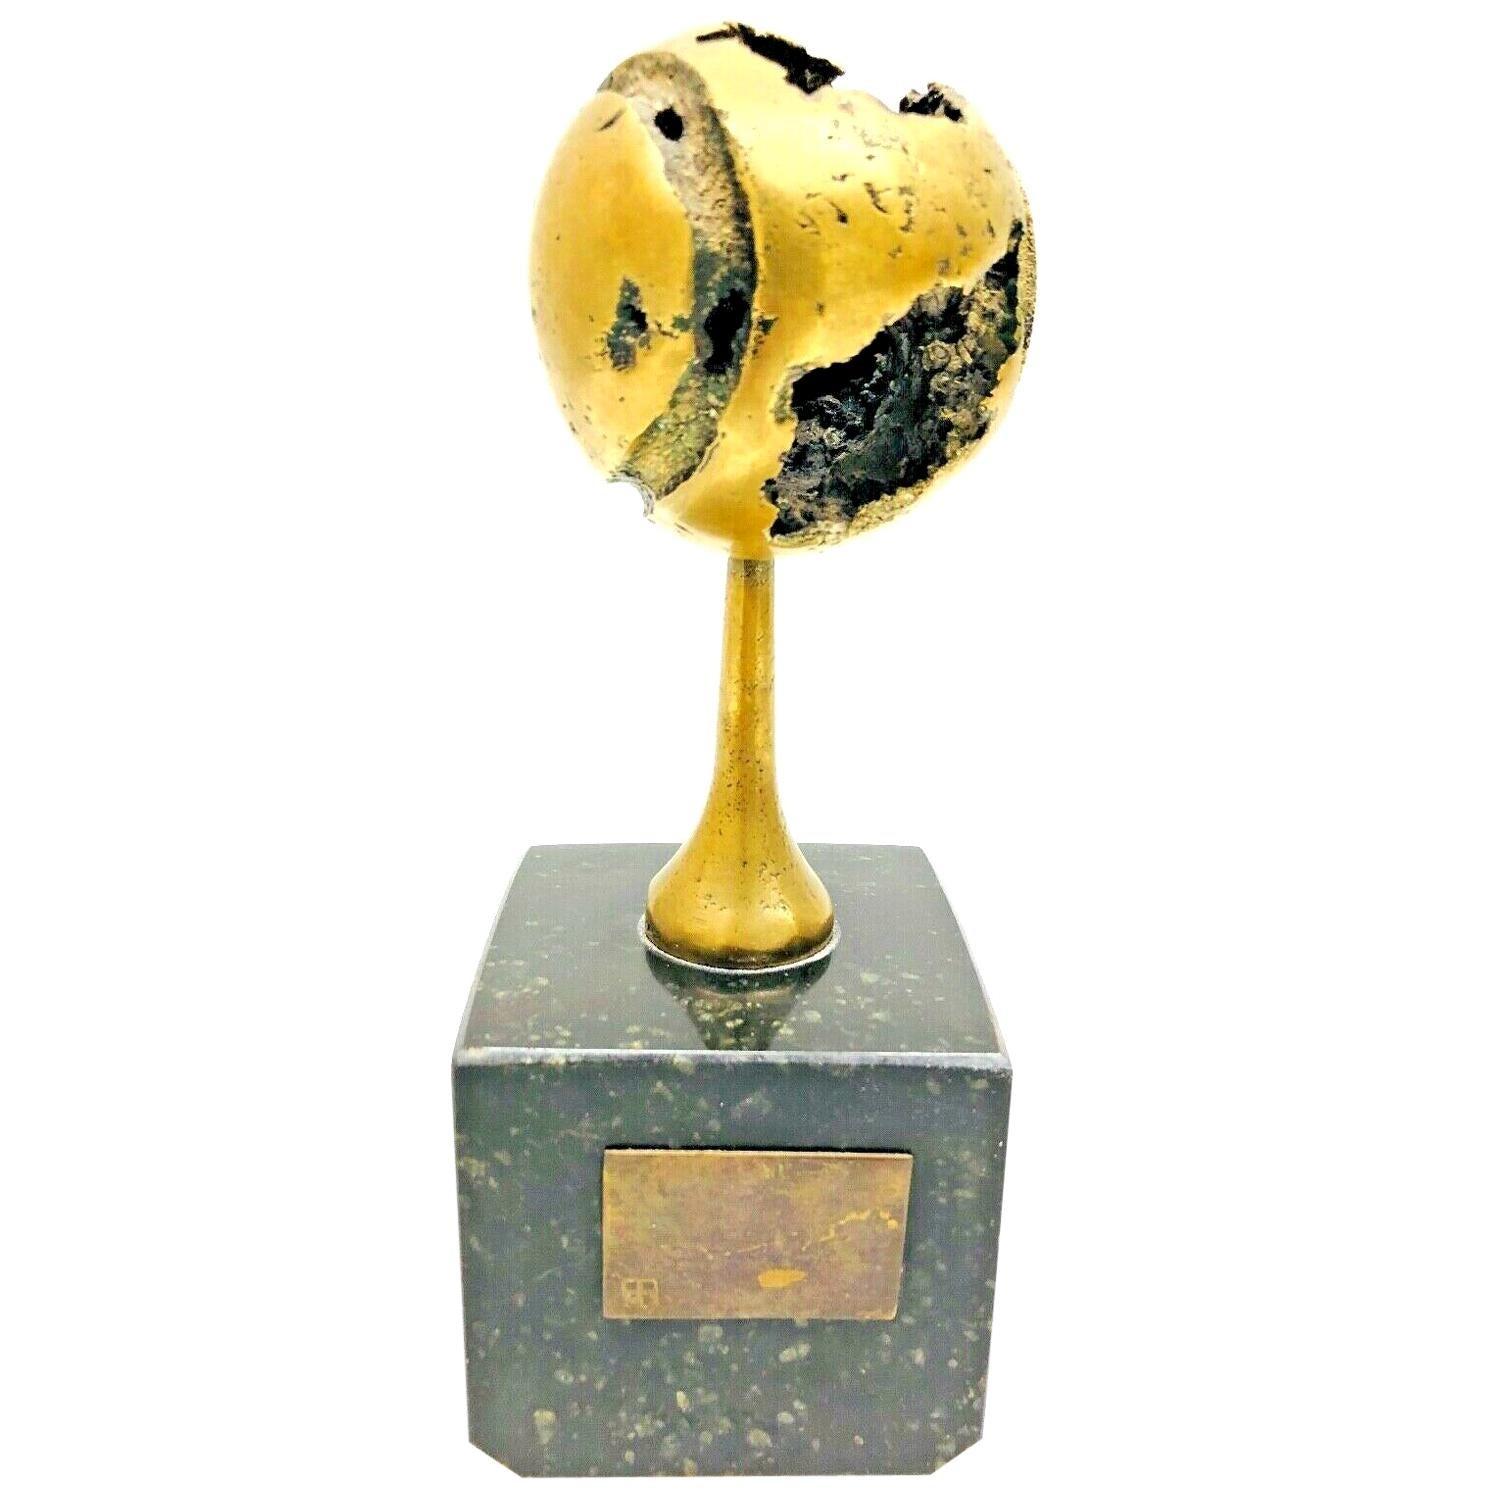 Brutalist Signed Tennis-Ball Bronze Sculpture on Marble Base, German, 1970s